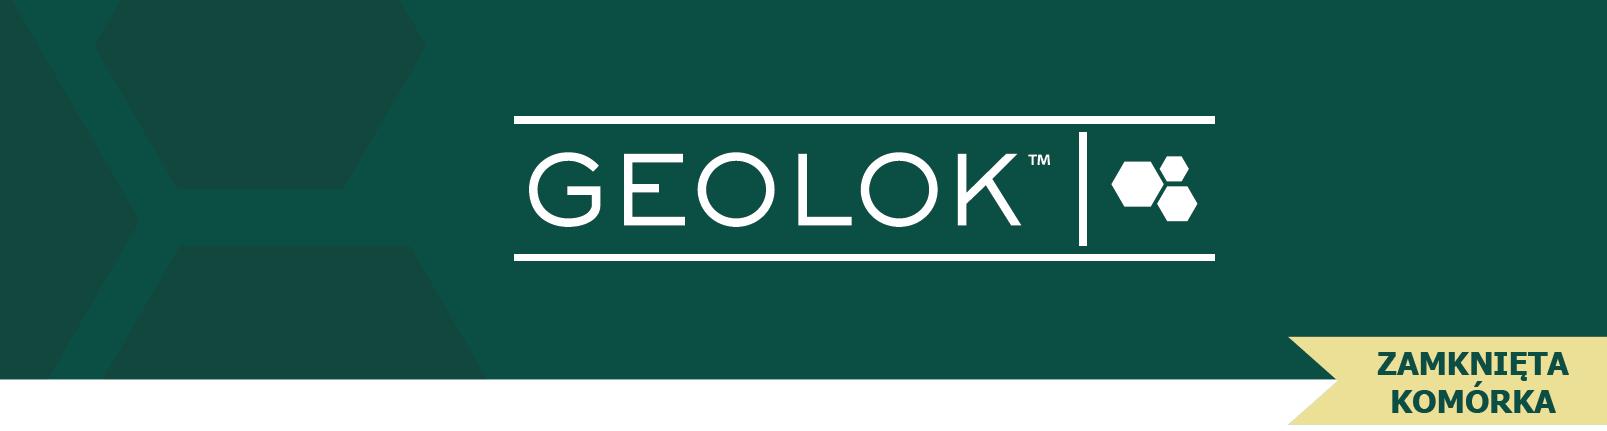 geolok